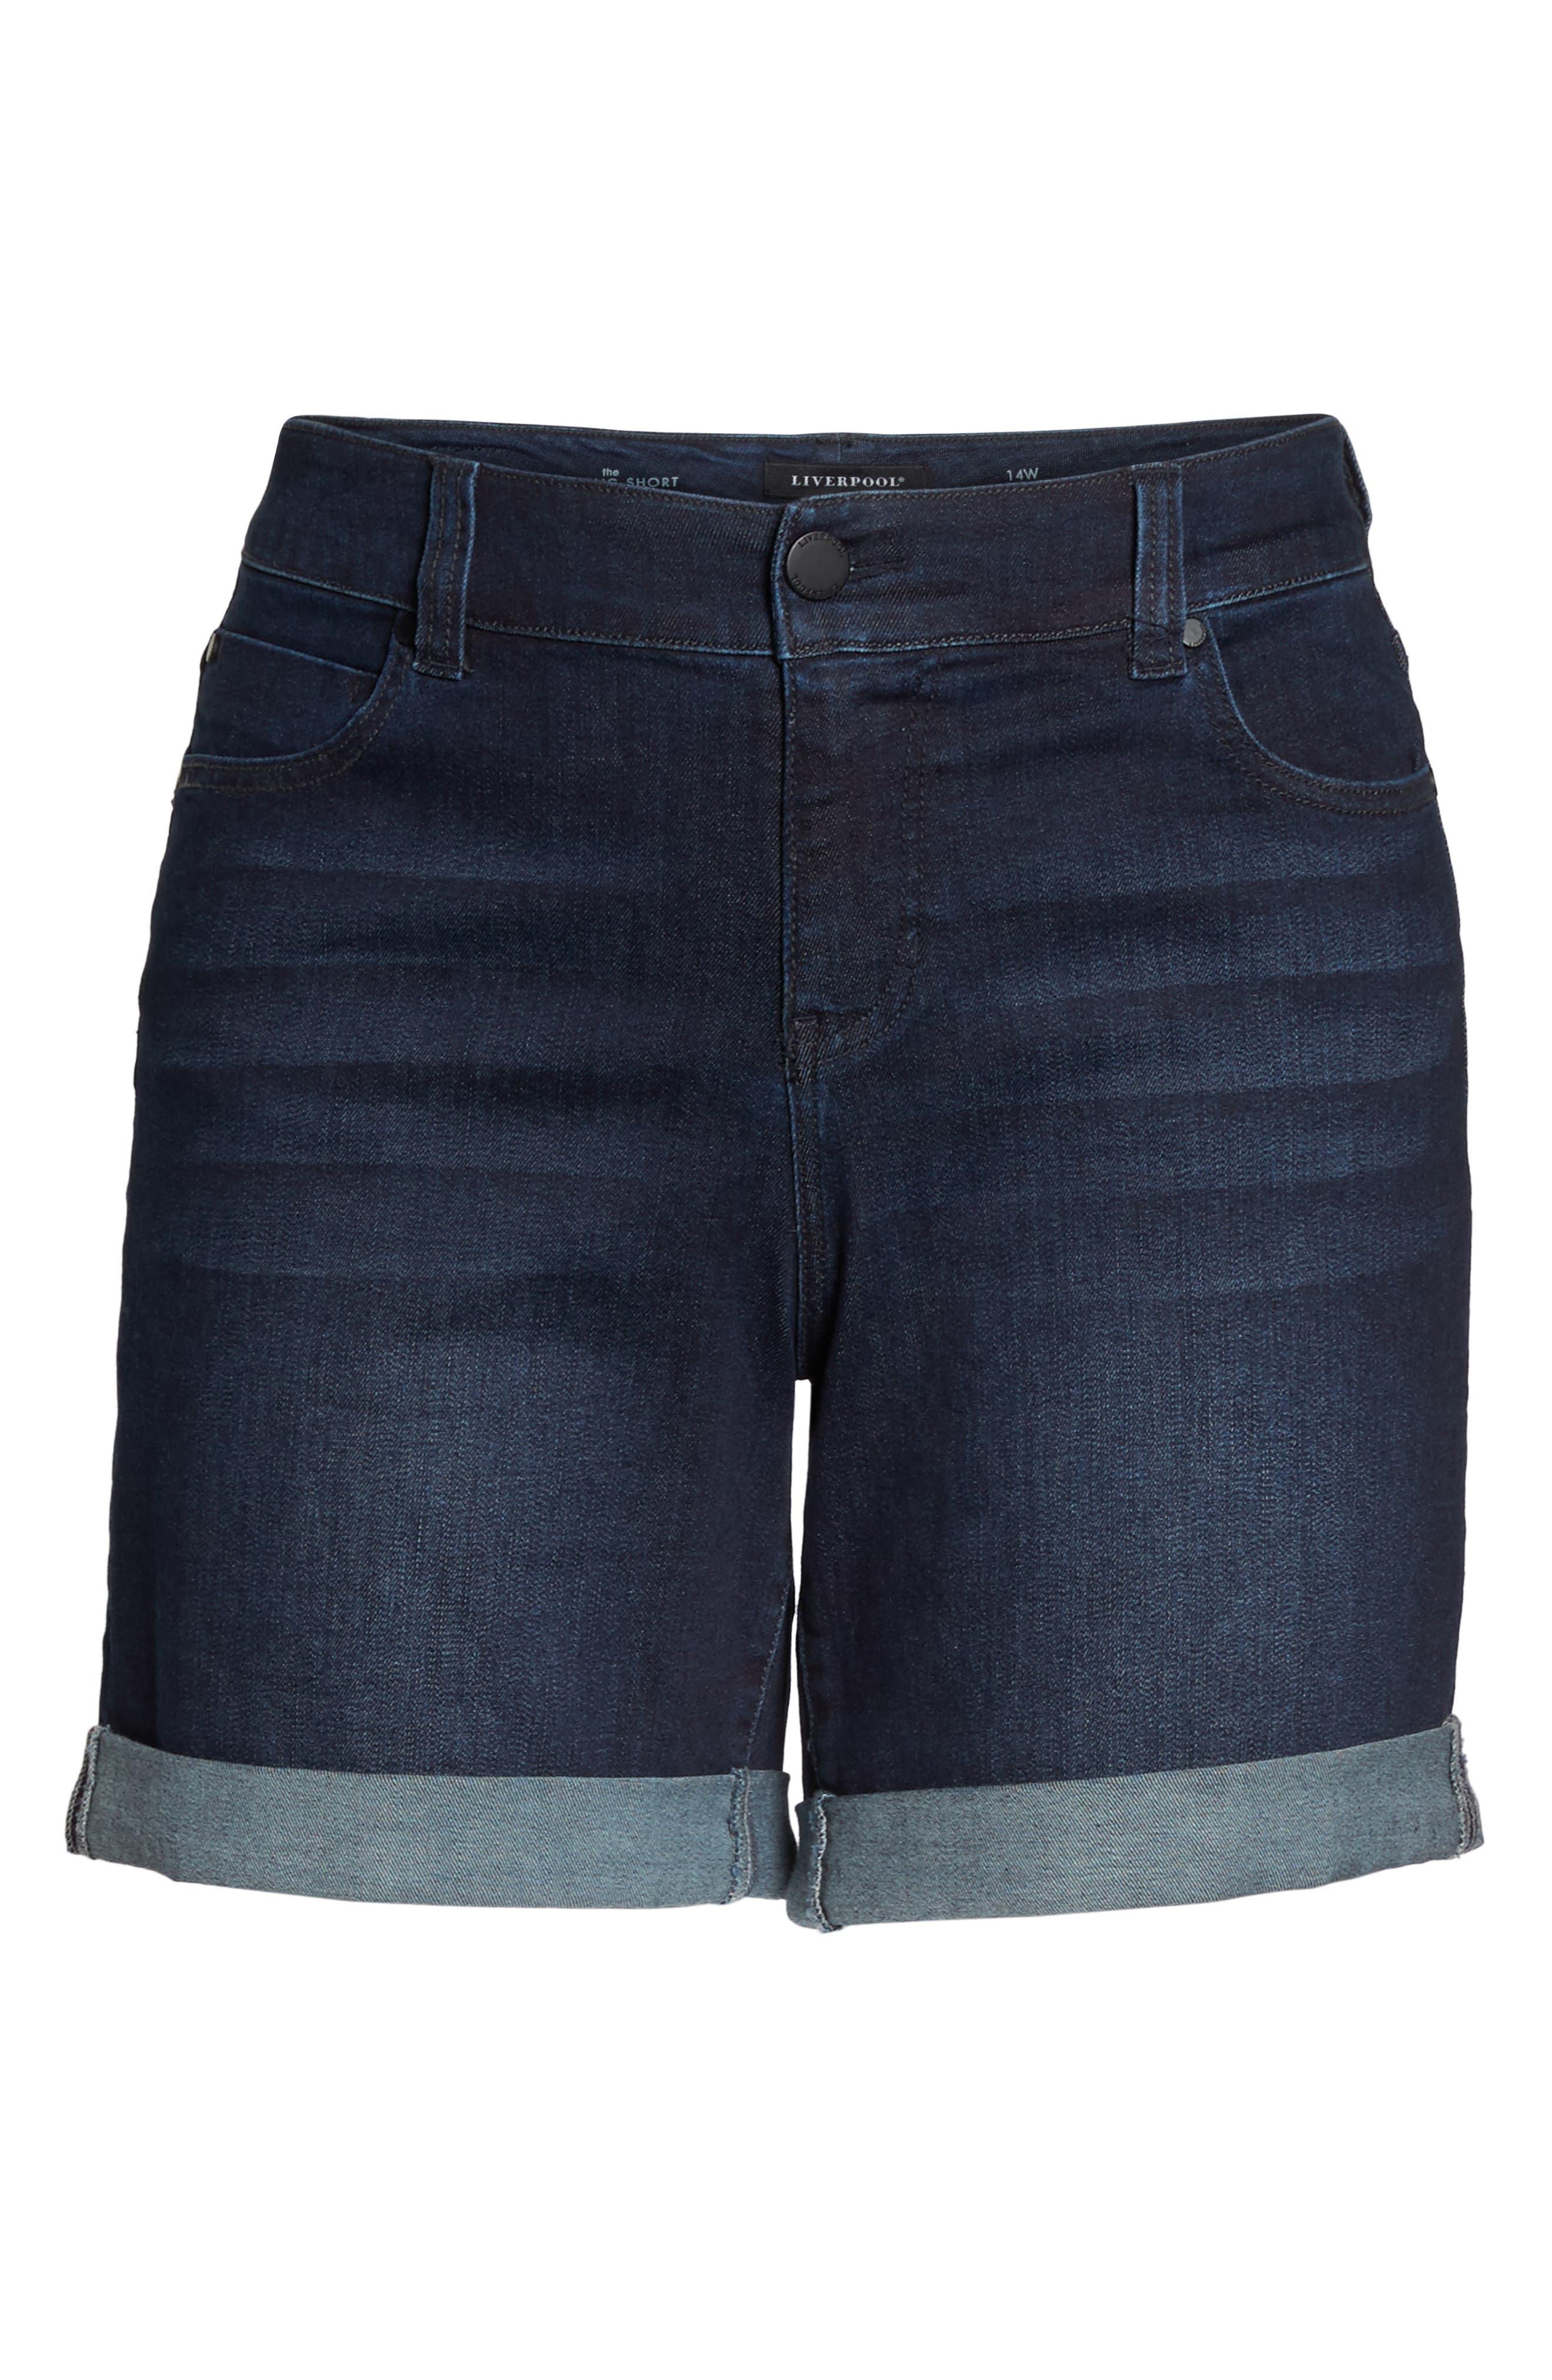 Corine Denim Shorts,                             Alternate thumbnail 7, color,                             401